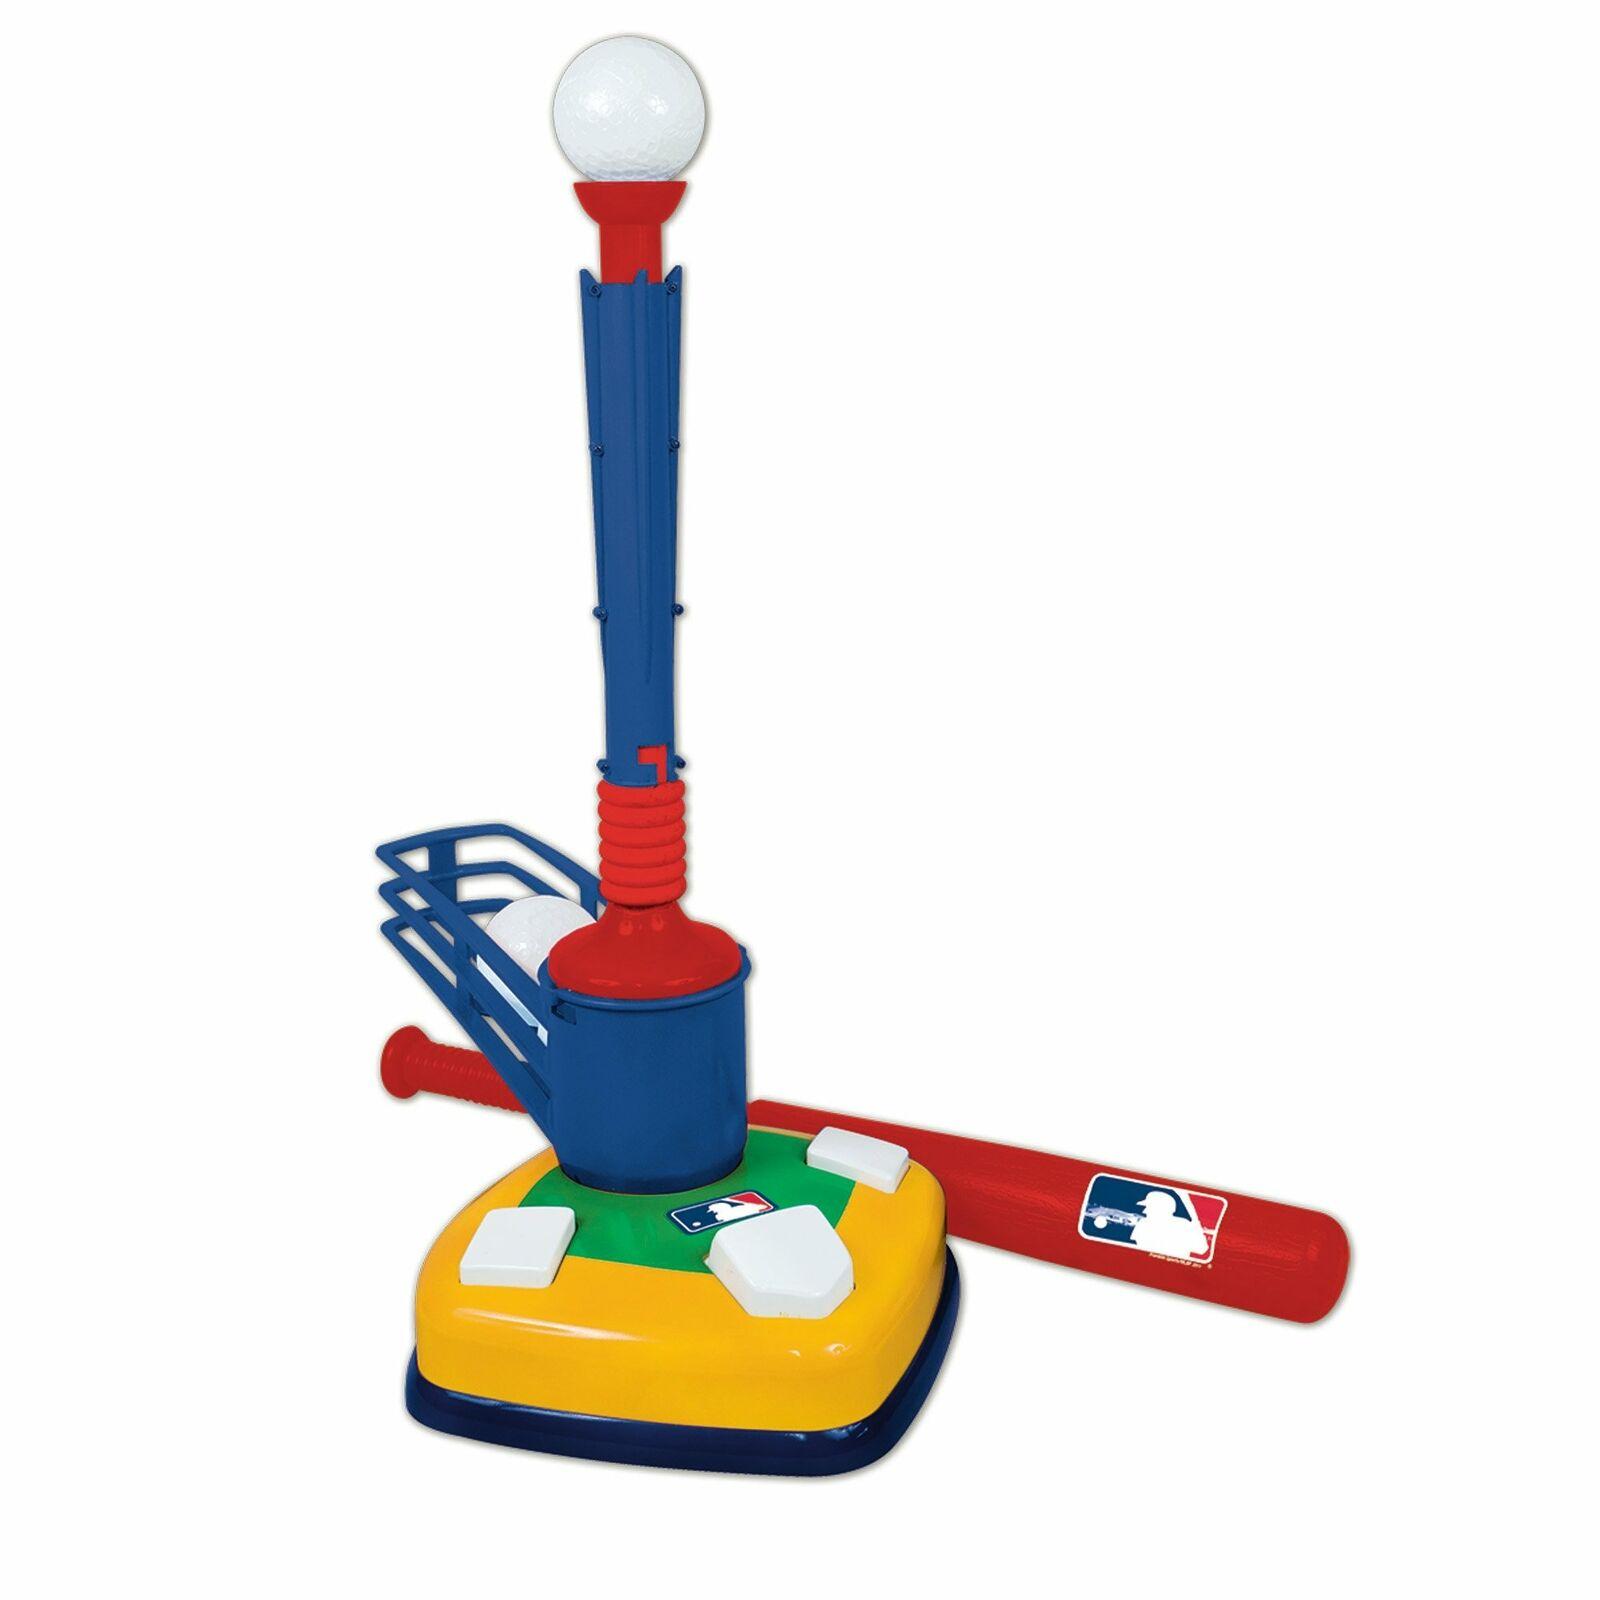 Baseball Toy Tee Ball Bat Pitch 2-in-1 Kids Toddlers Fun Training MLB Sport Set